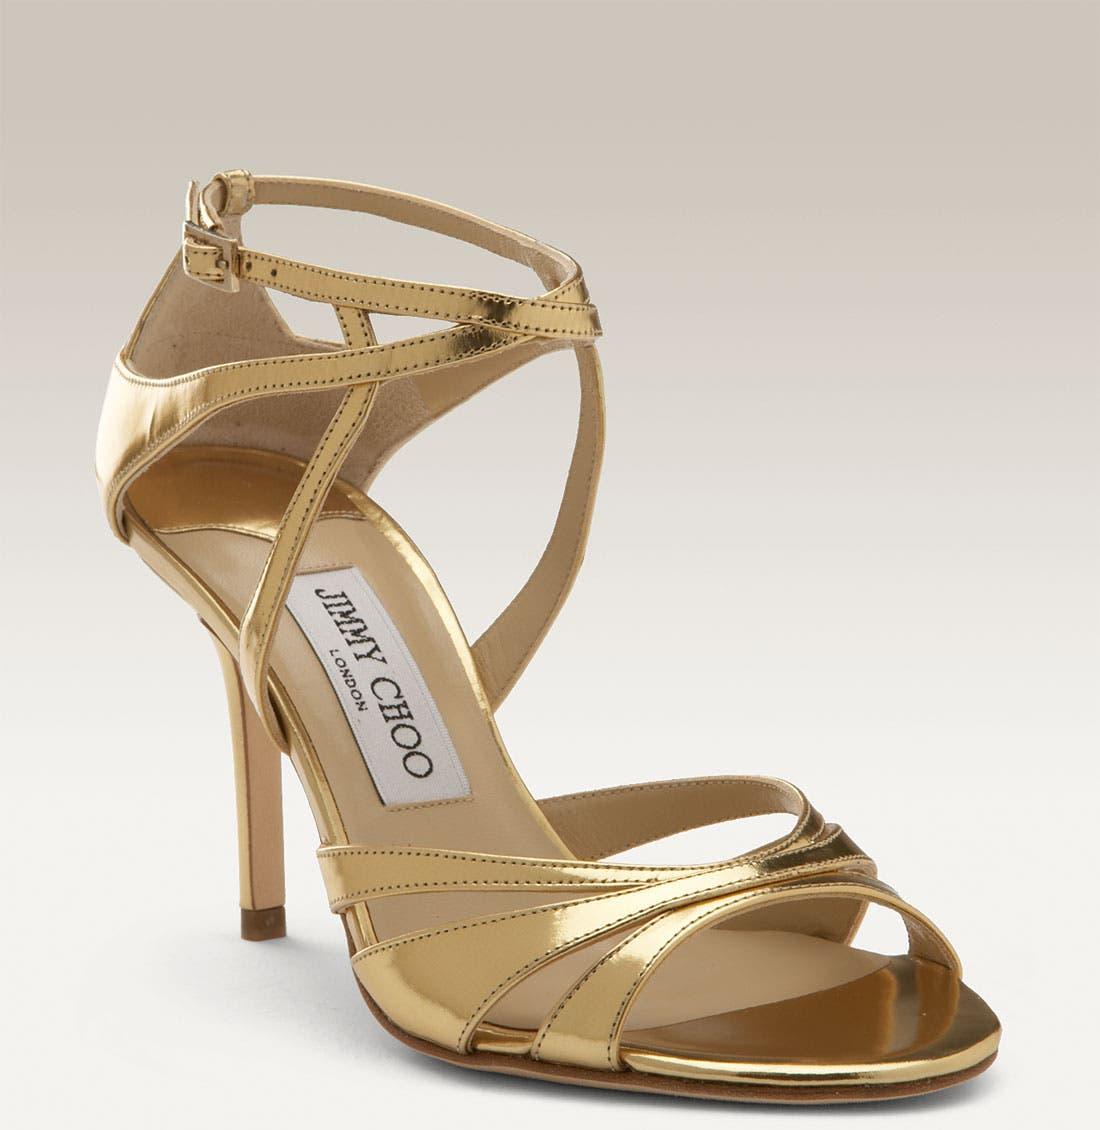 Alternate Image 1 Selected - Jimmy Choo 'Freya' Metallic Leather Sandal